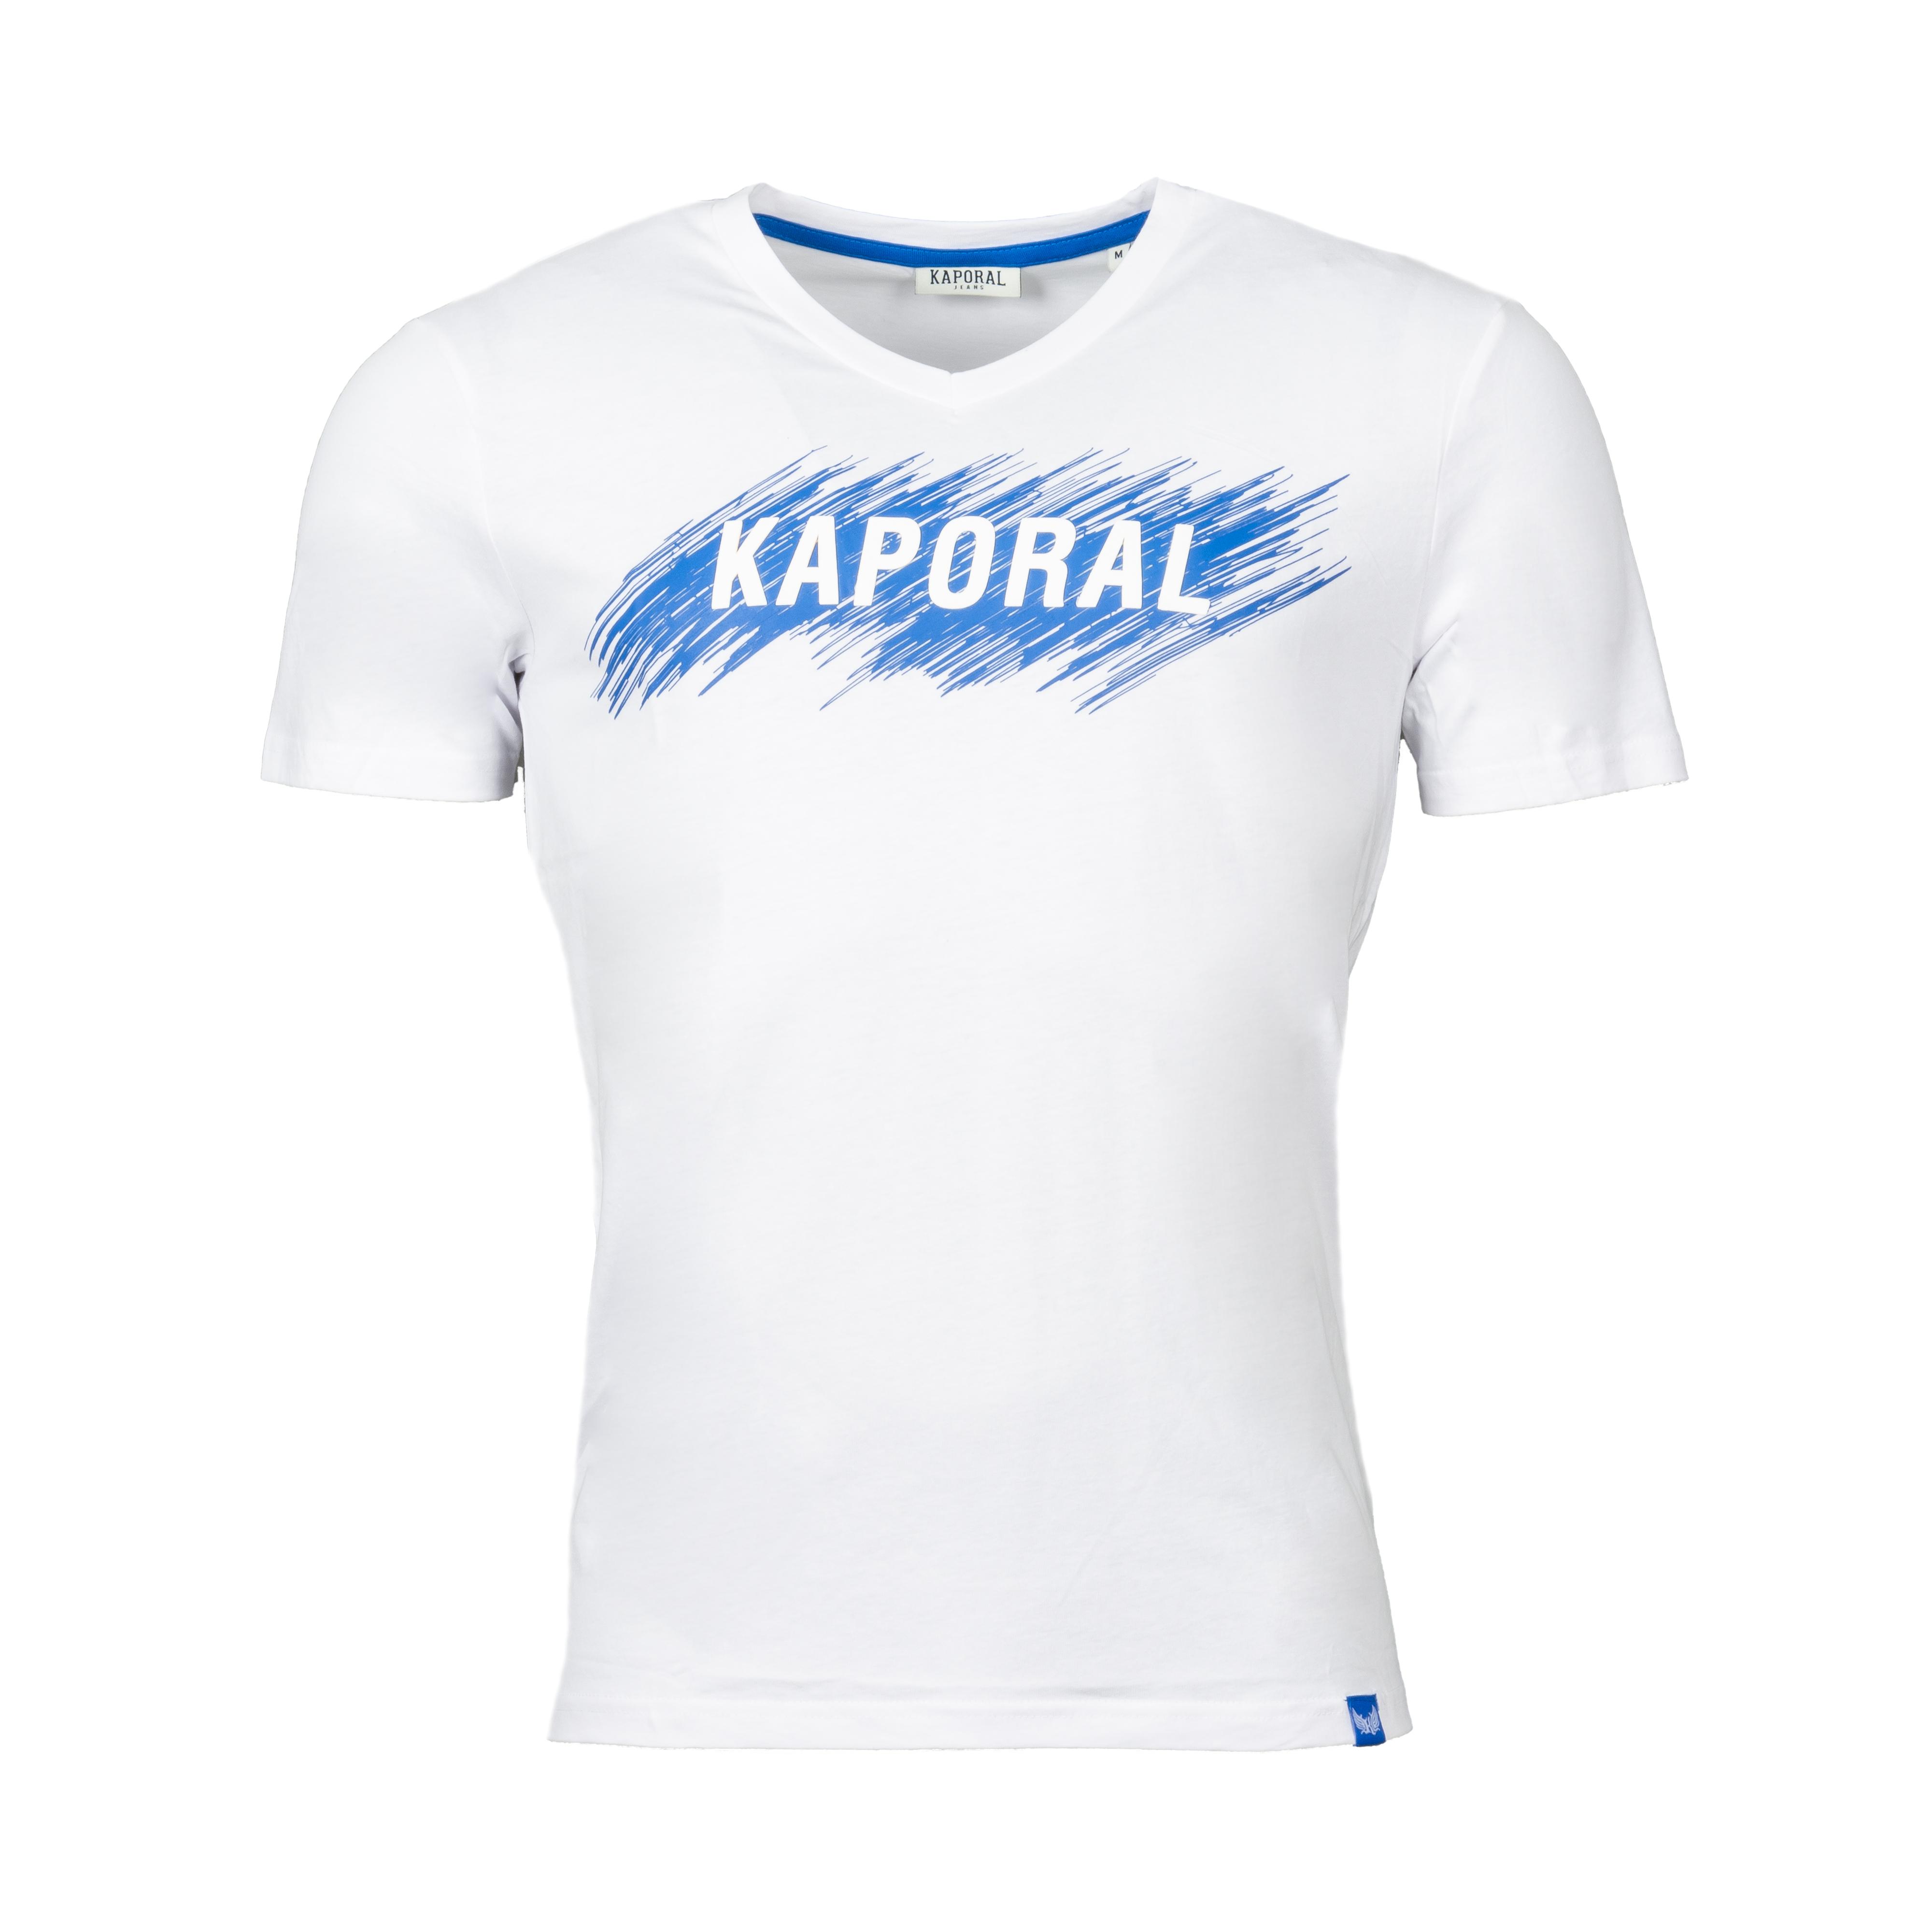 Tee-shirt col v  masse en coton blanc floqué en bleu